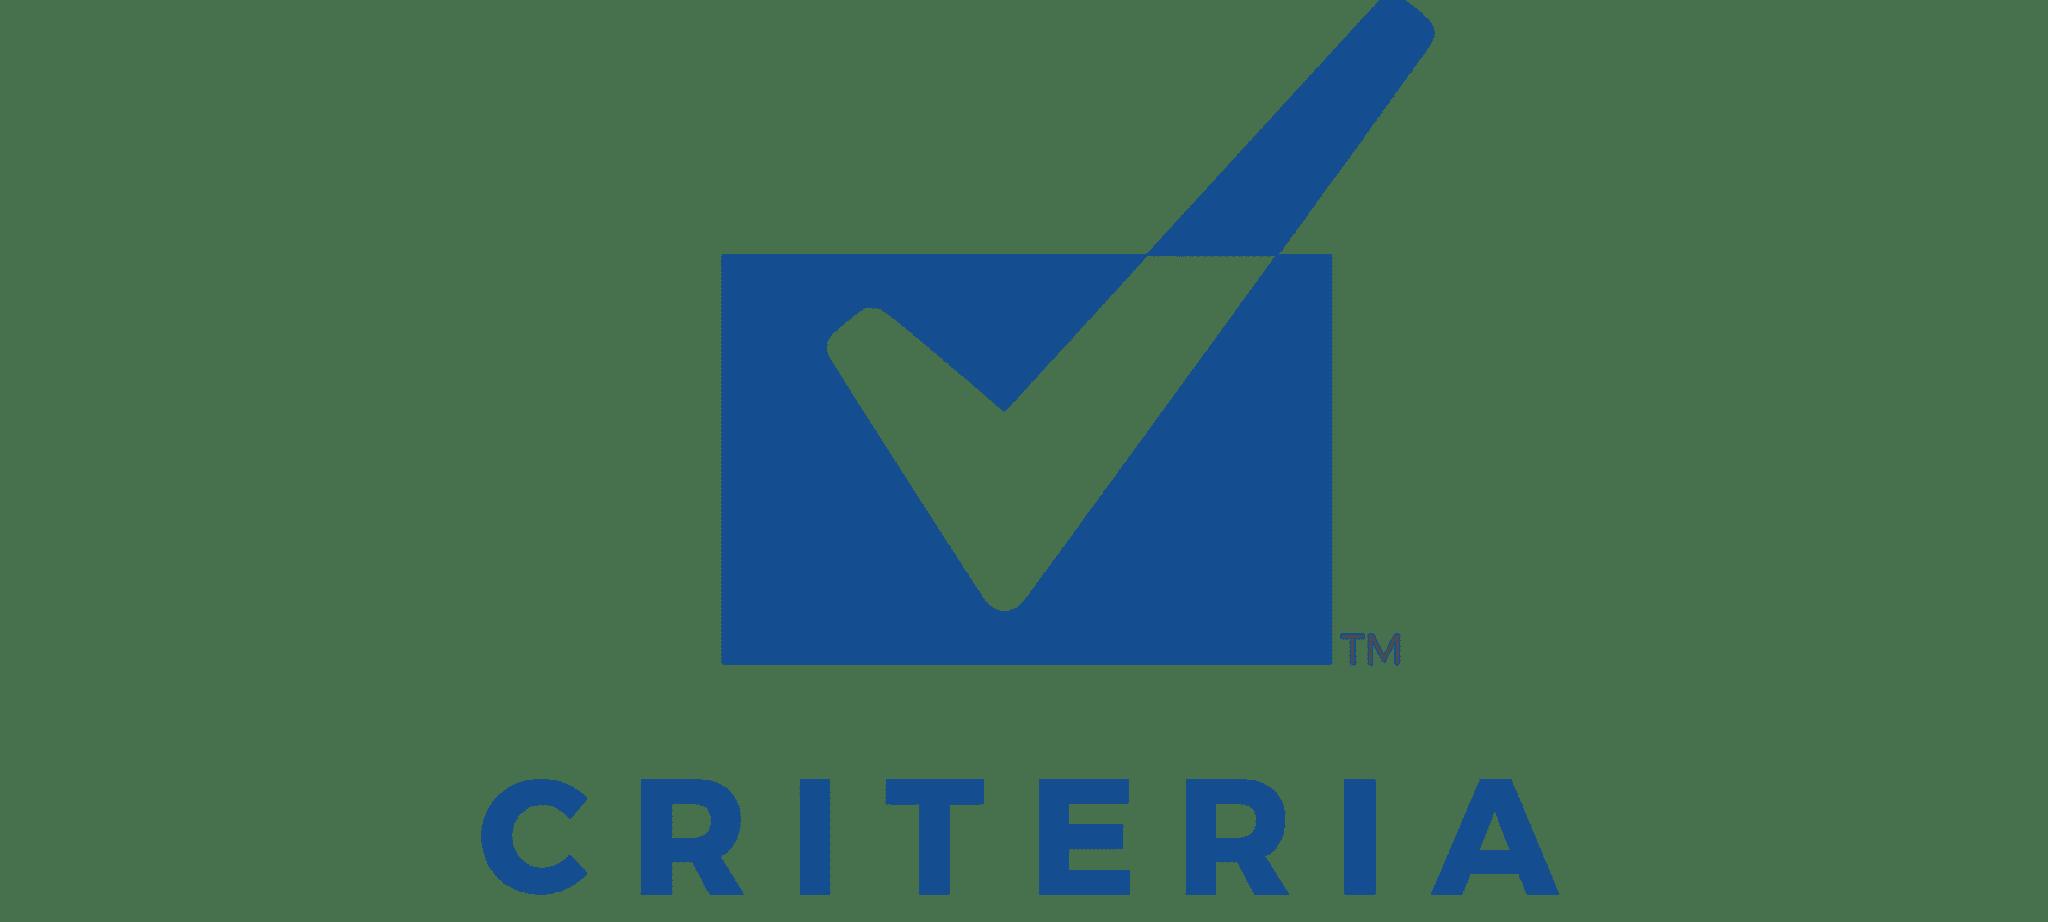 CriteriaLogo2018